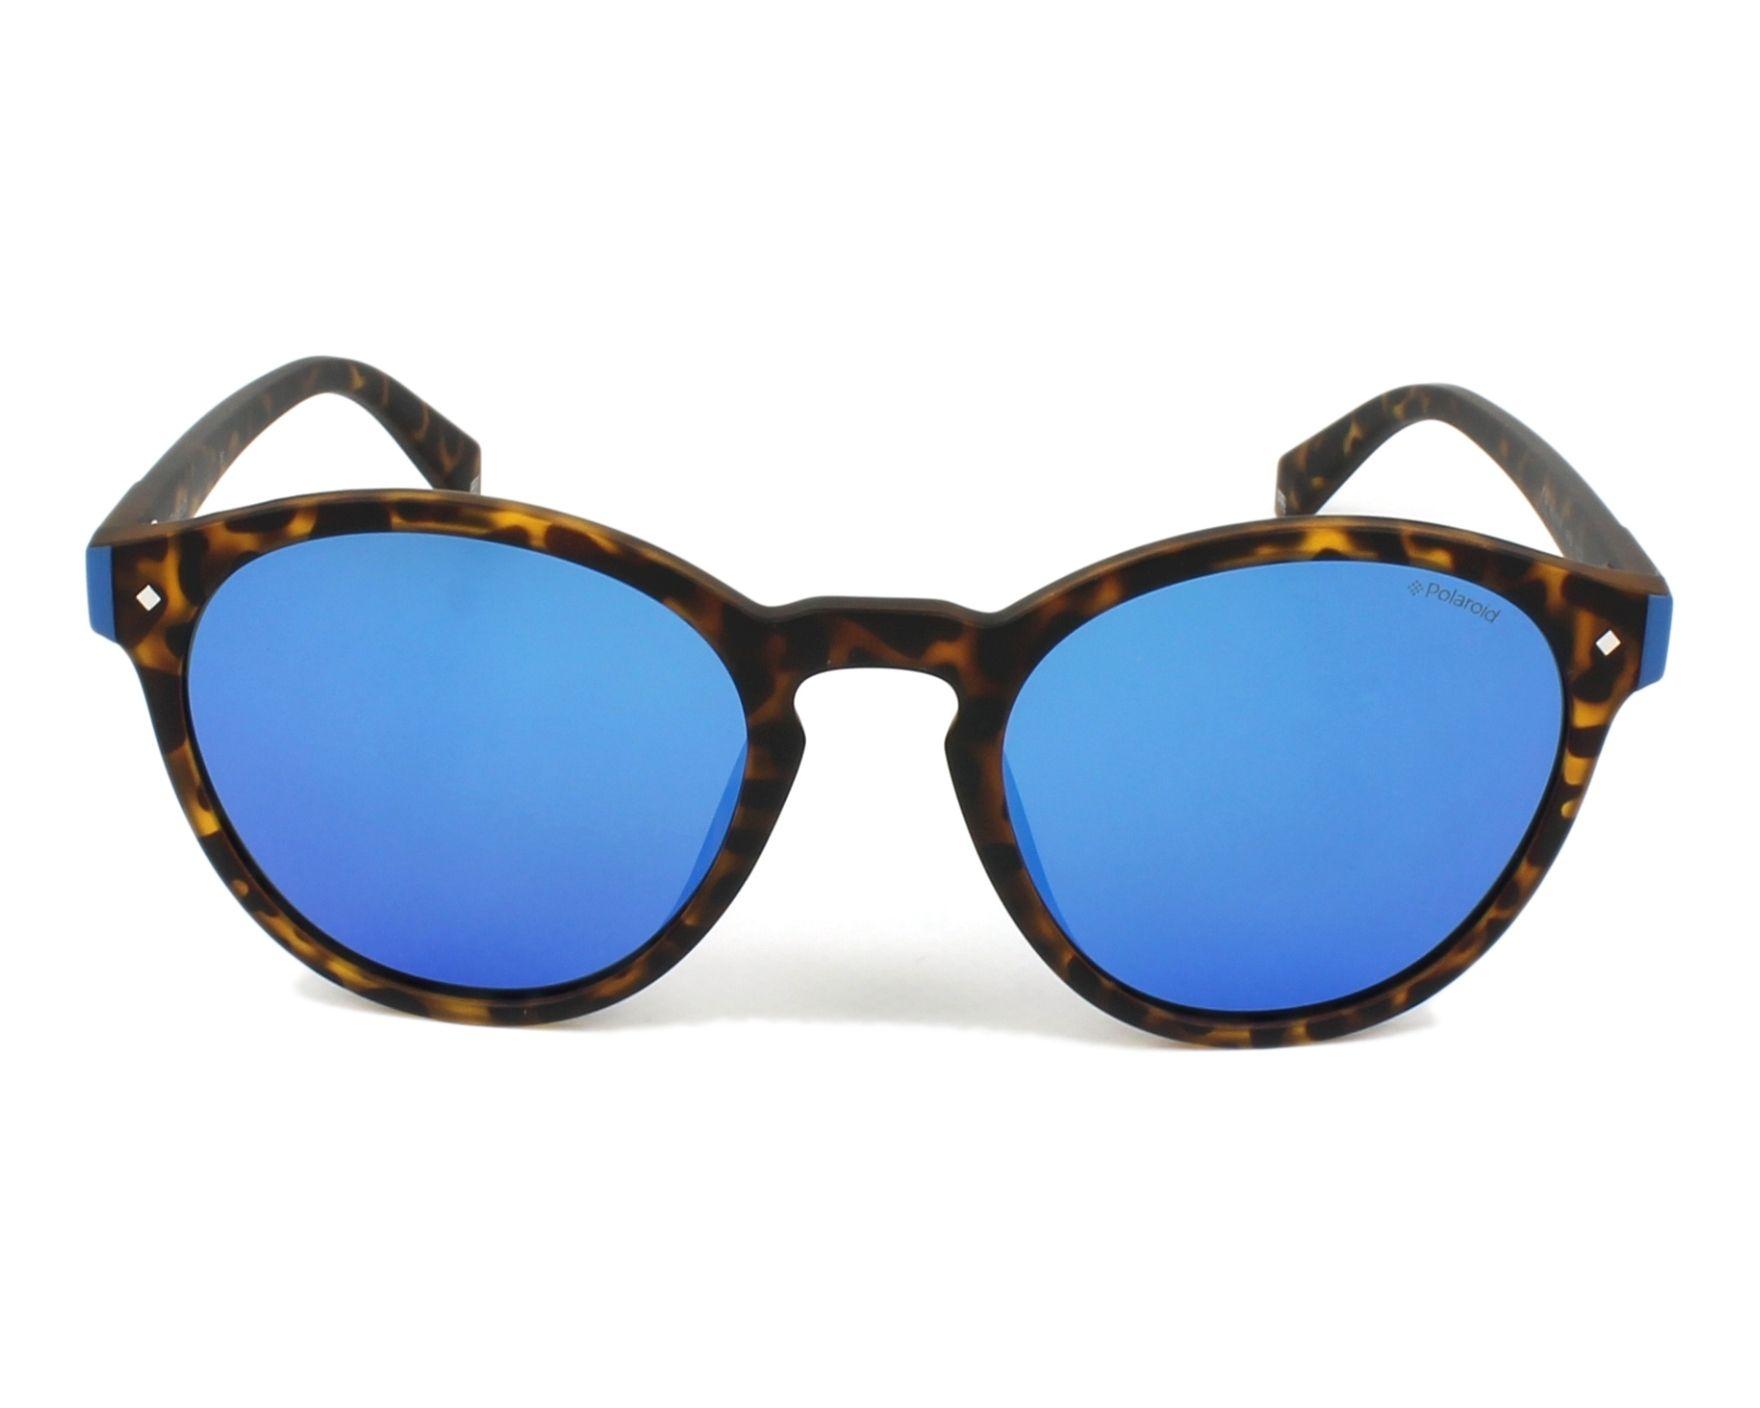 cbc555f22a7 thumbnail Sunglasses Polaroid PLD-6034-S N9P 5X - Havana Blue front view